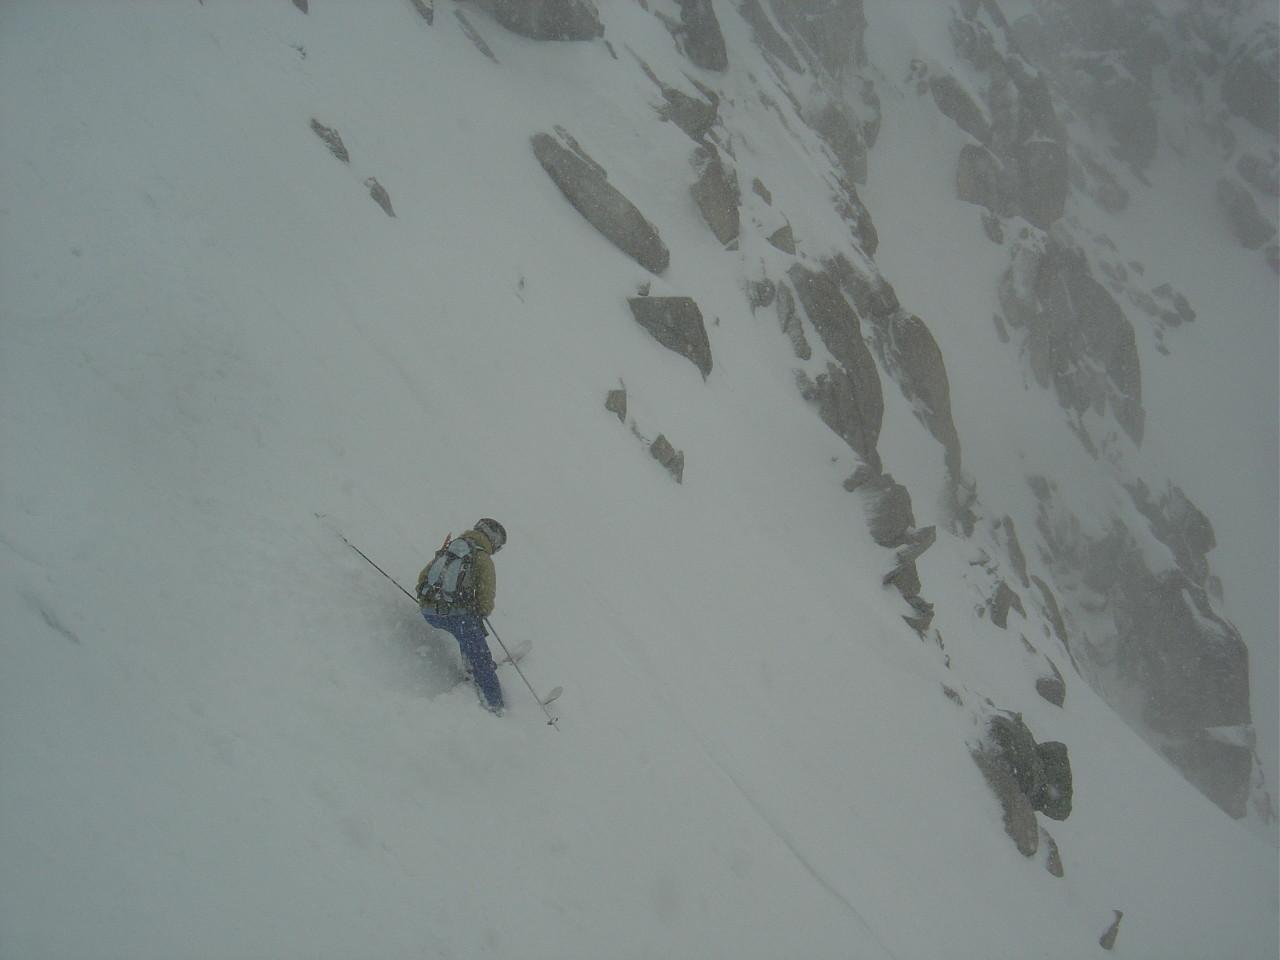 Belle skieuse! Beau style!